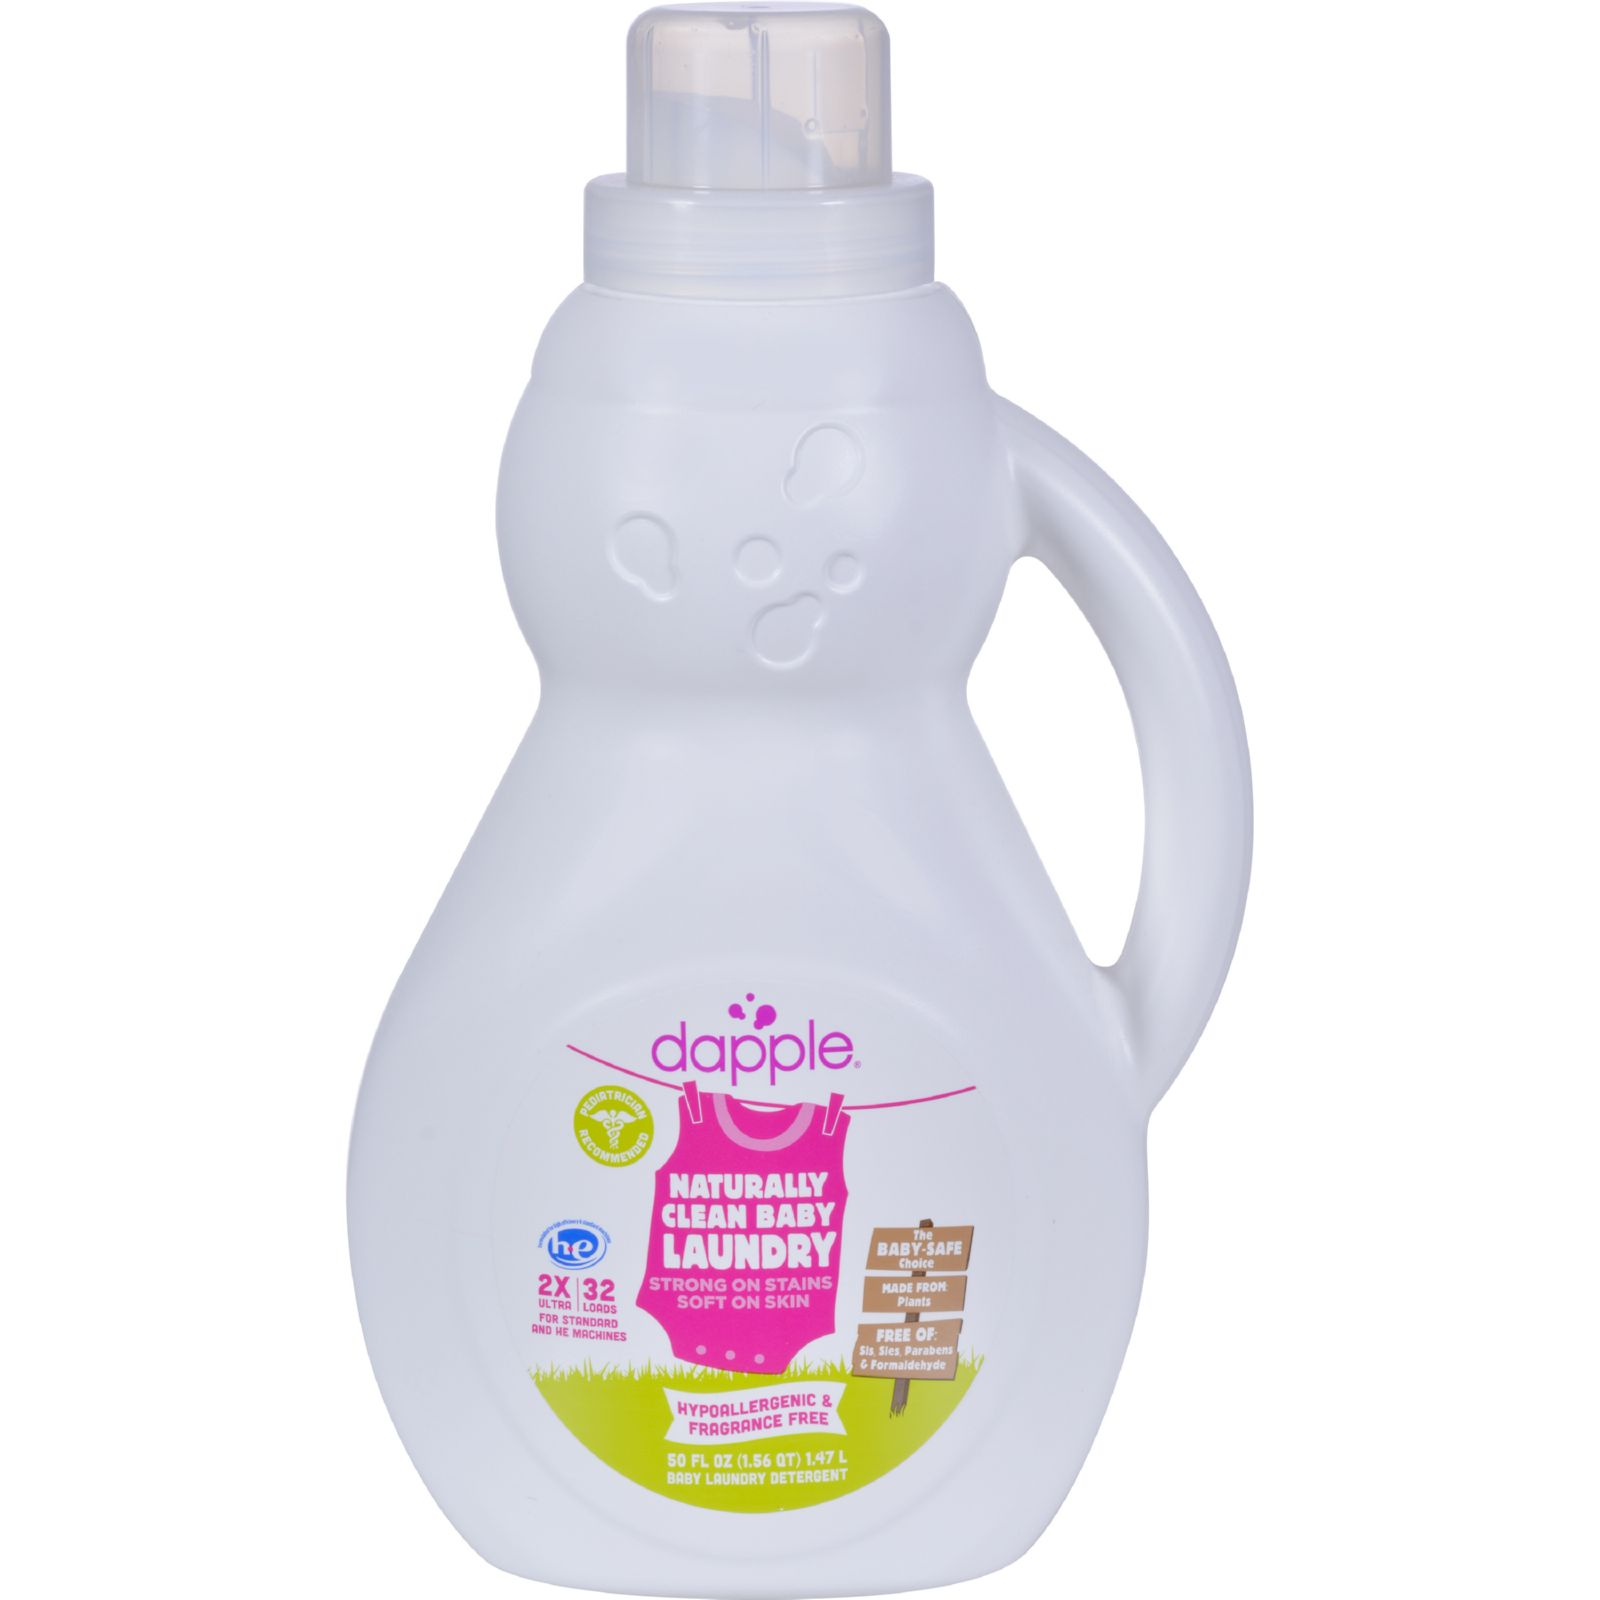 Dapple Baby Laundry Detergent - 50 oz